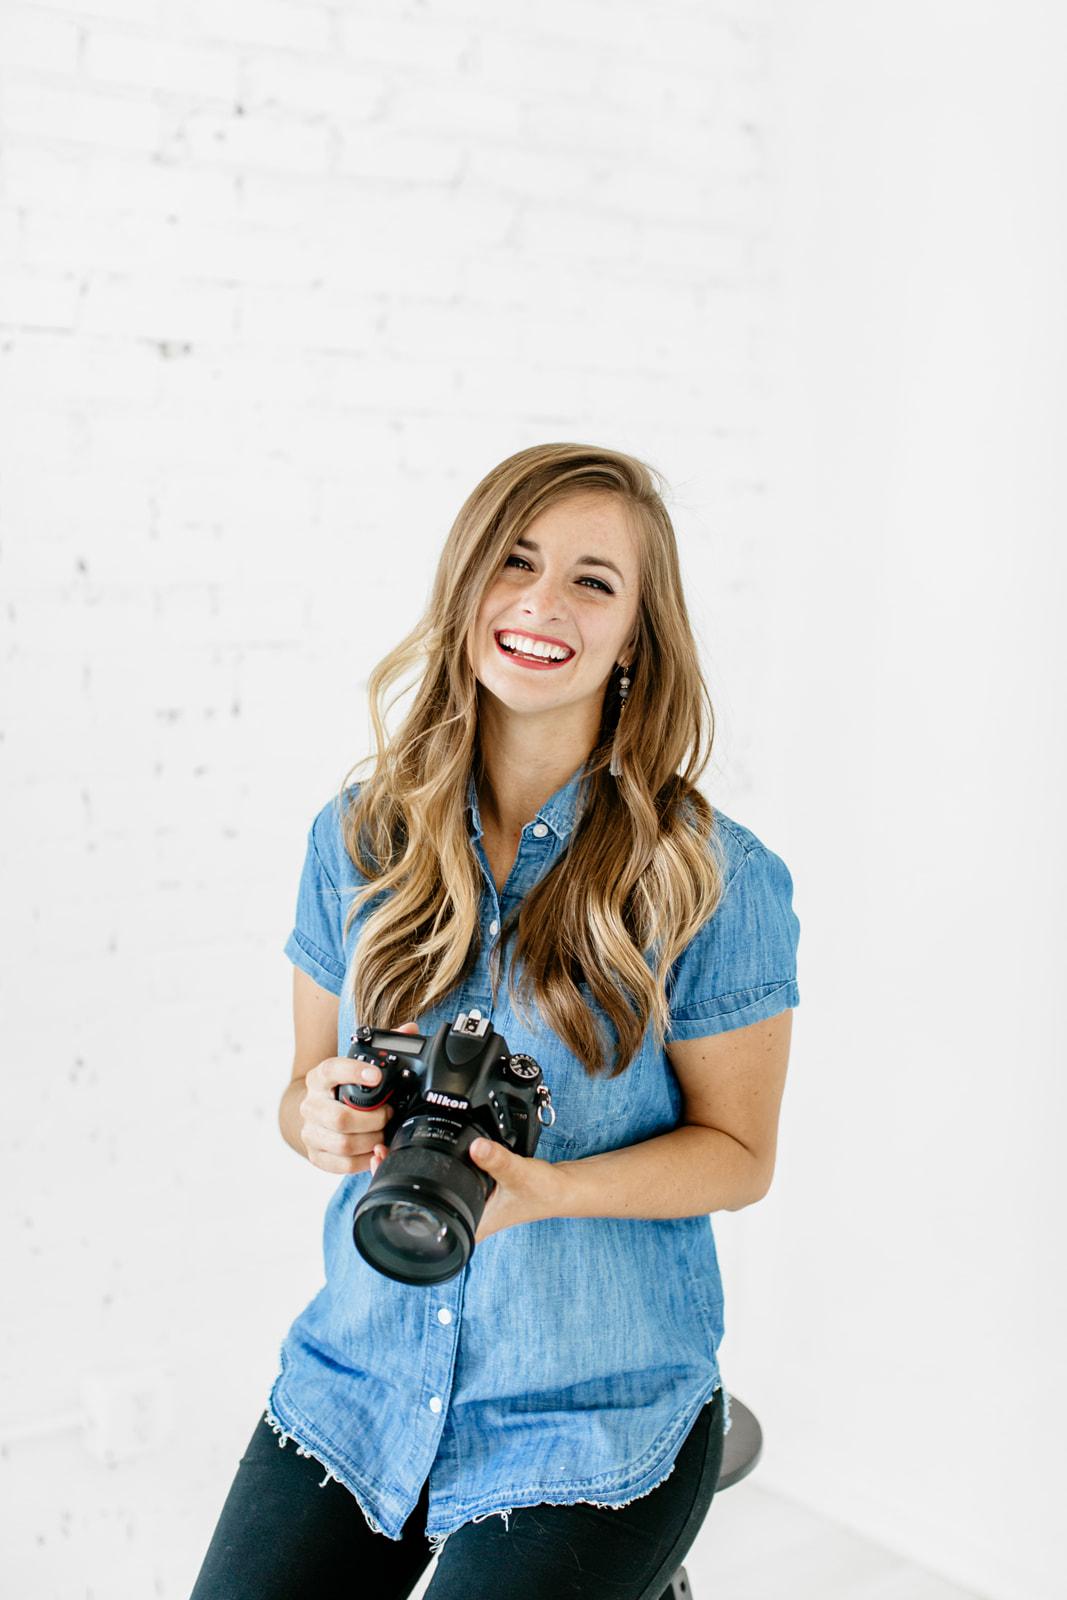 Alexa-Vossler-Photo_Dallas-Headshot-Photographer_Photographer-Headshots-at-The-Lumen-Room_Kelcy-Enriquez-4.jpg